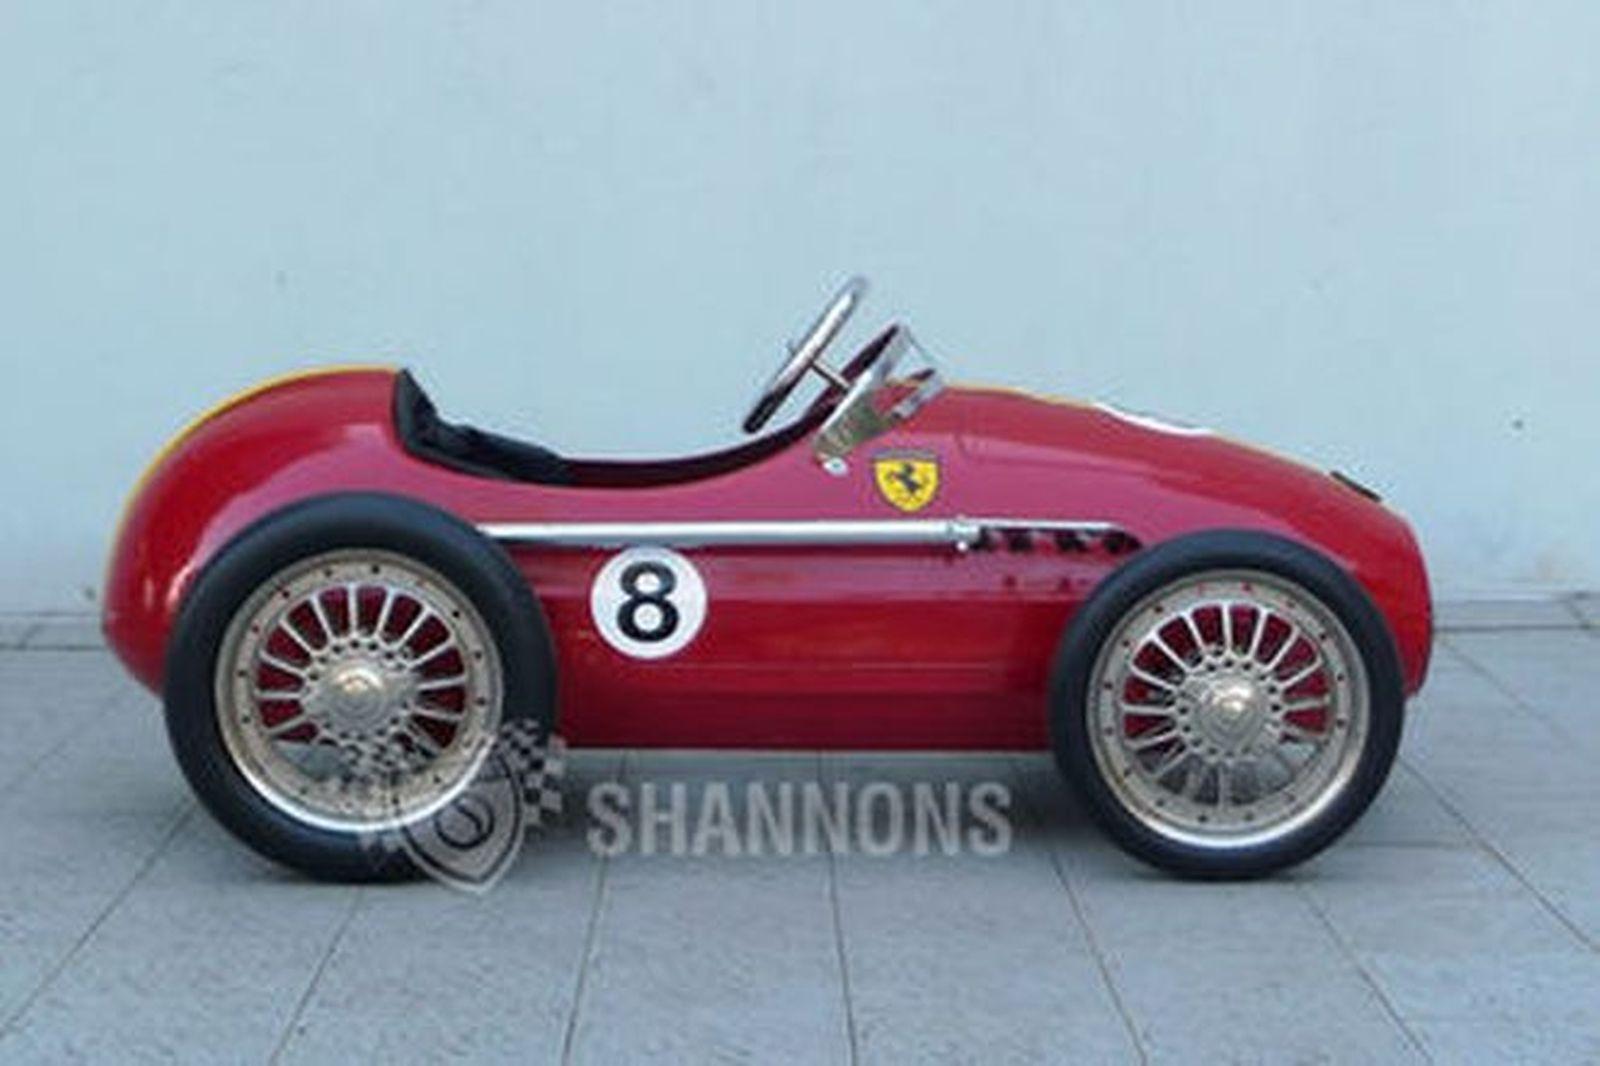 Sold Metal Pedal Car Ferrari Tribute Approx 120cm Long Auctions Lot O Shannons